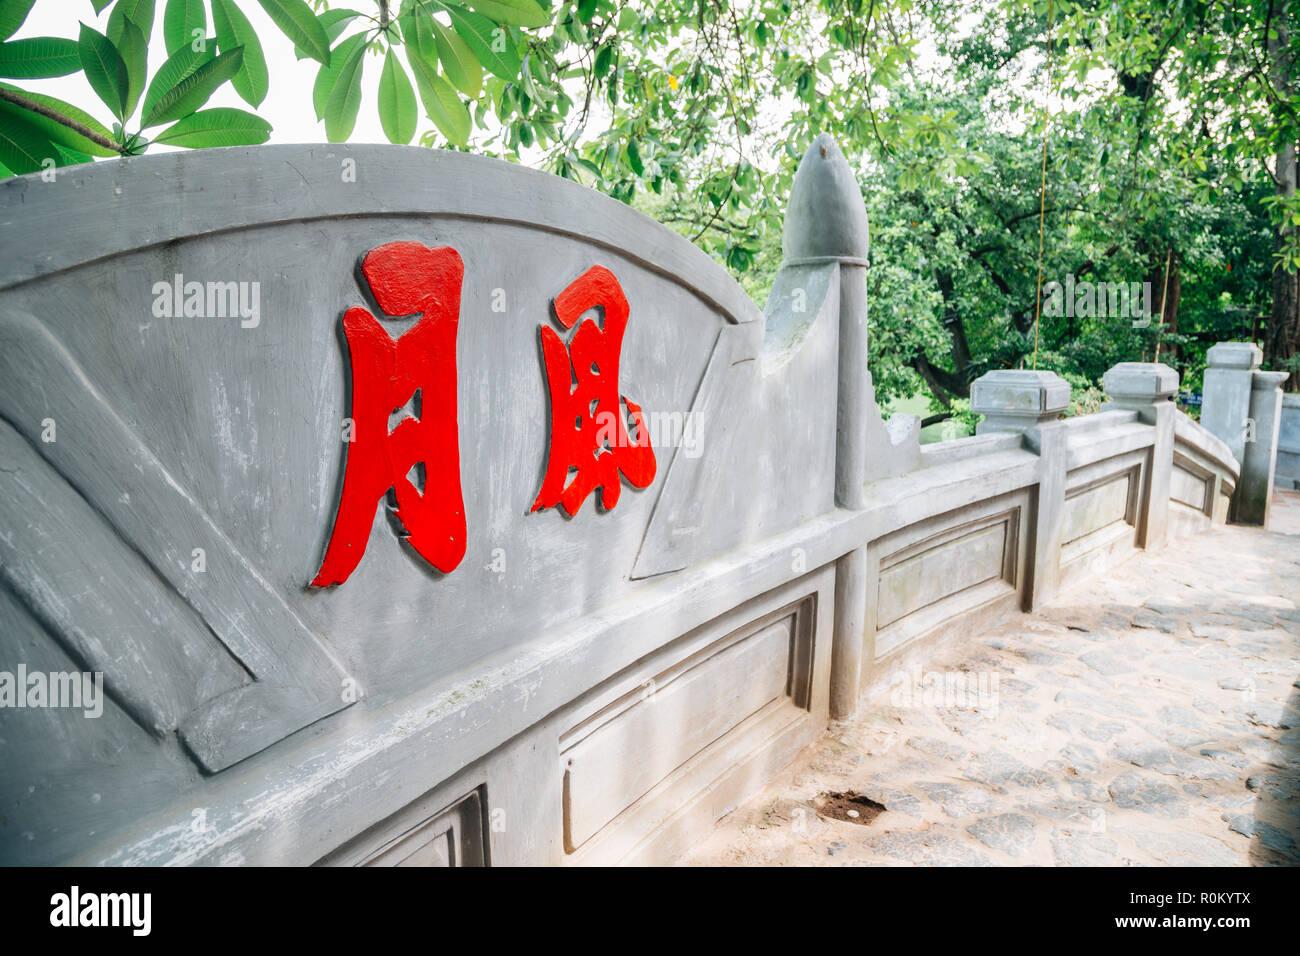 Den ngoc son temple in Hanoi, Vietnam - Stock Image